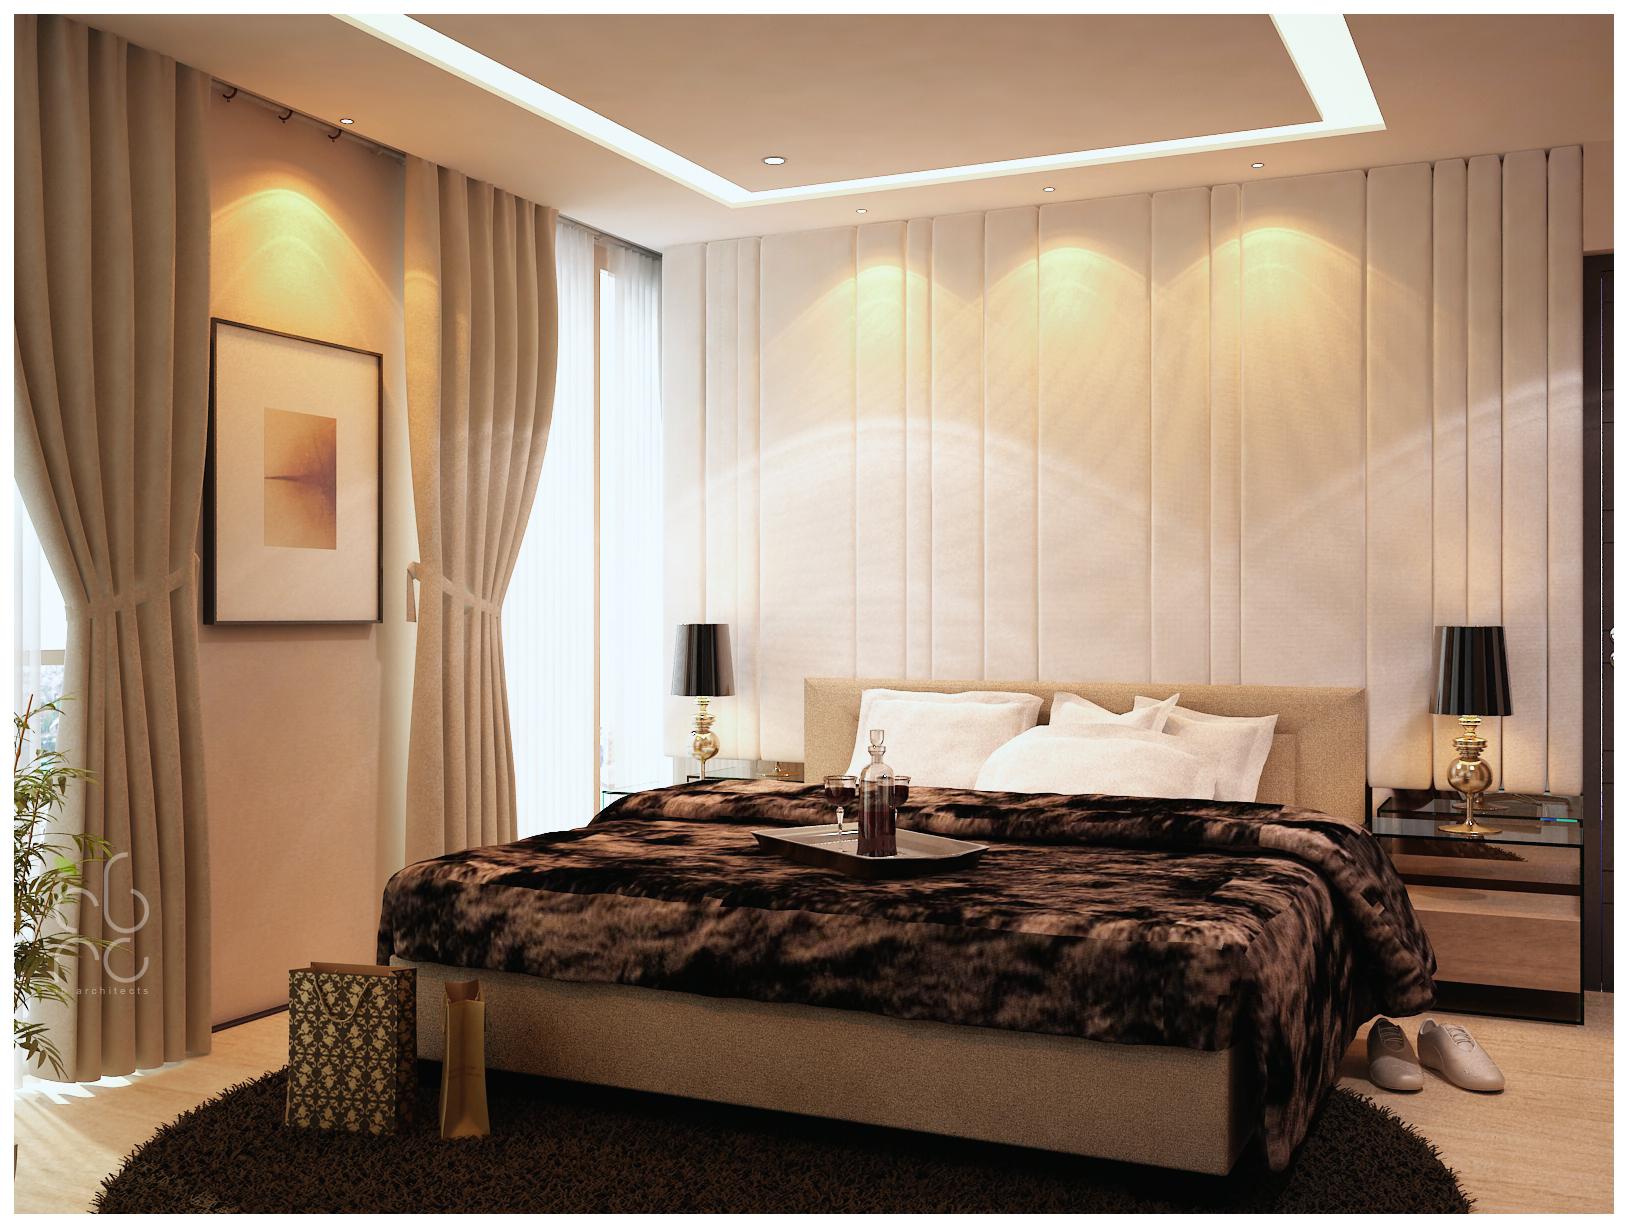 kamar tidur utama_2 by okamiammaterasu on DeviantArt